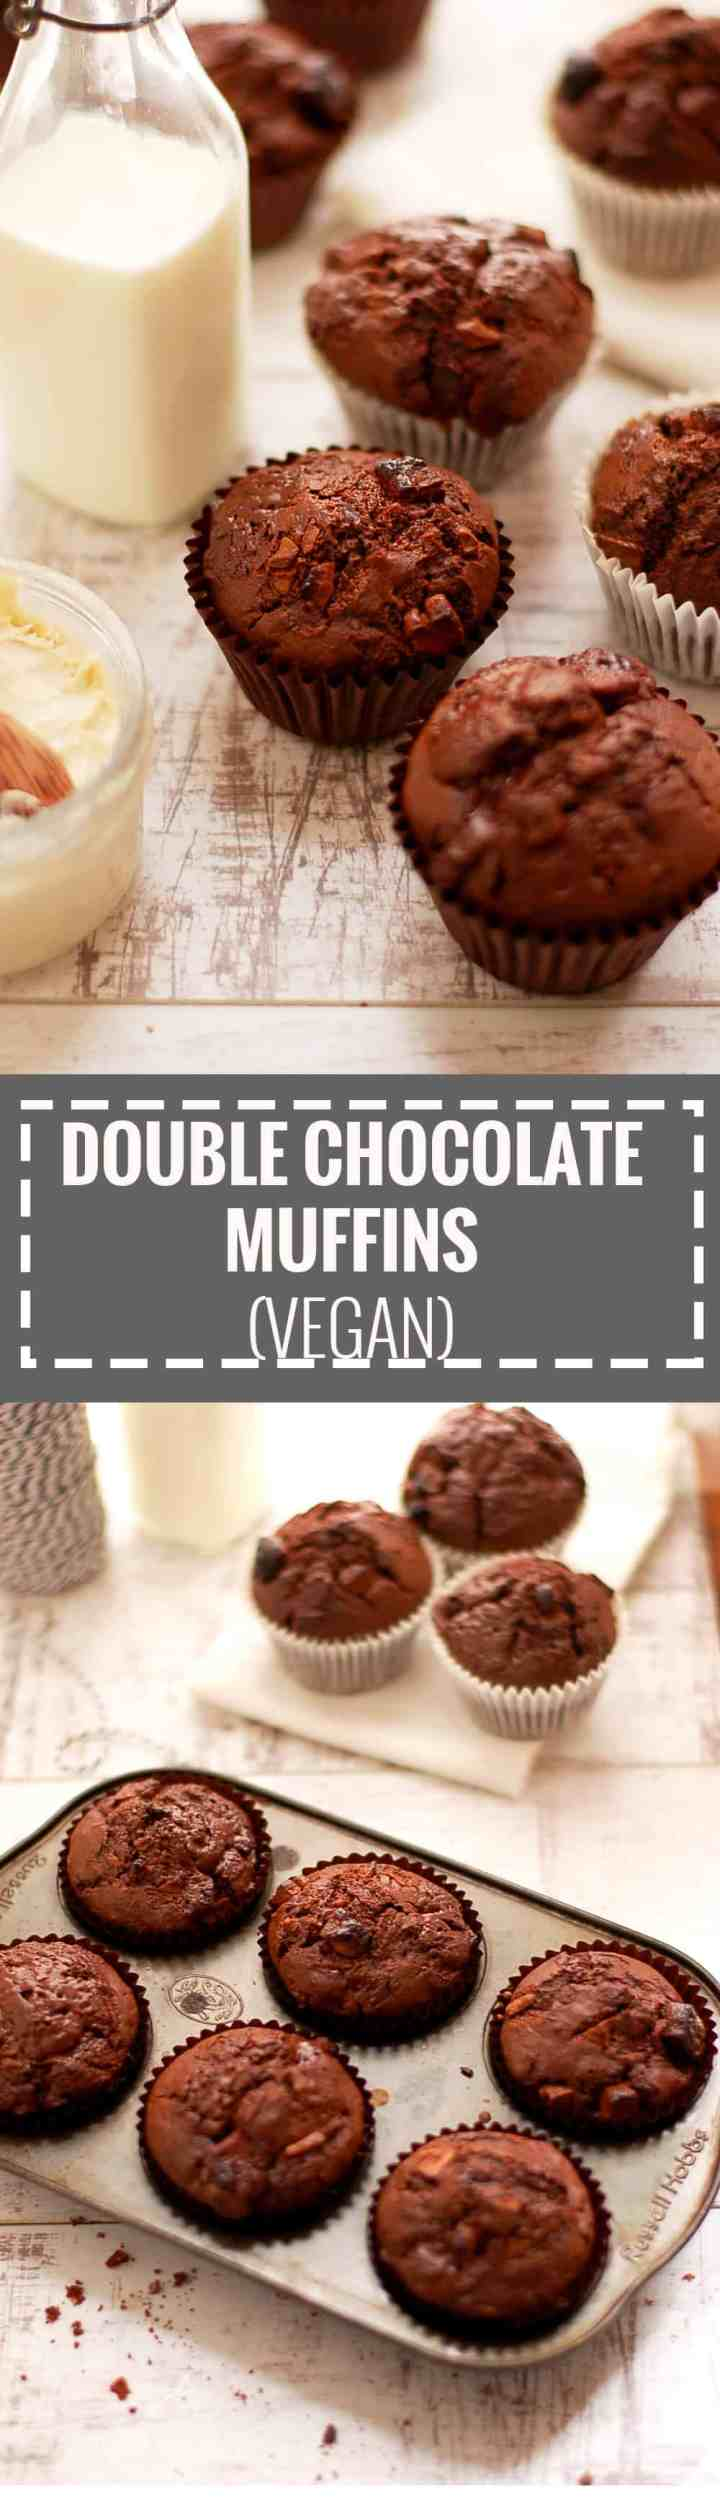 Chocolate-Muffins-Pinterest